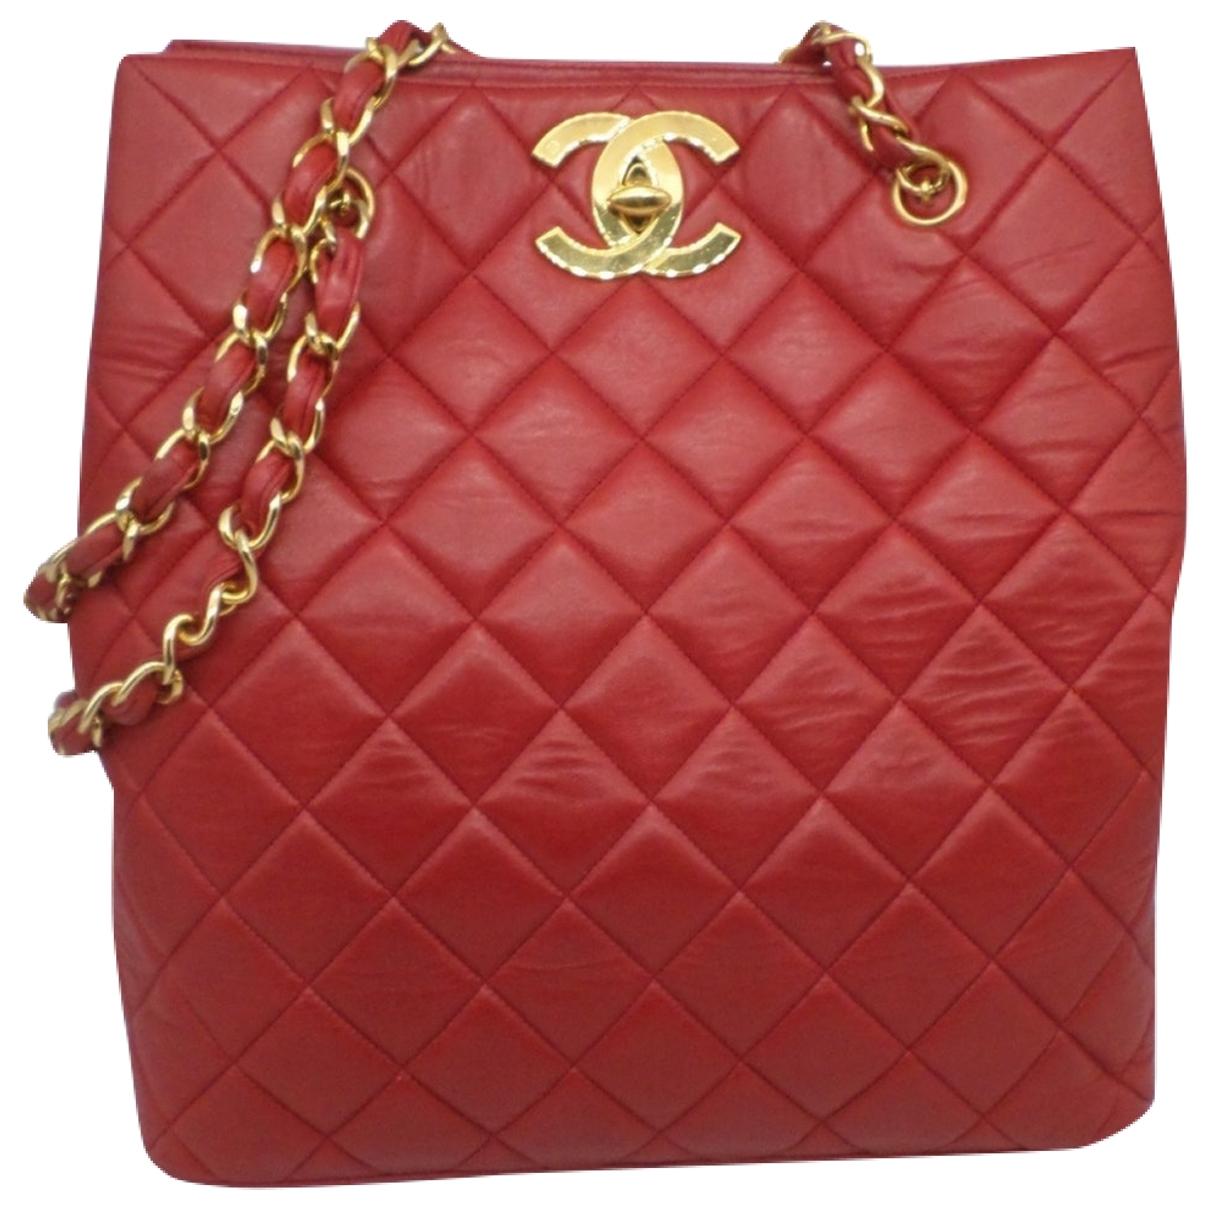 Cabas Grand shopping de Cuero Chanel